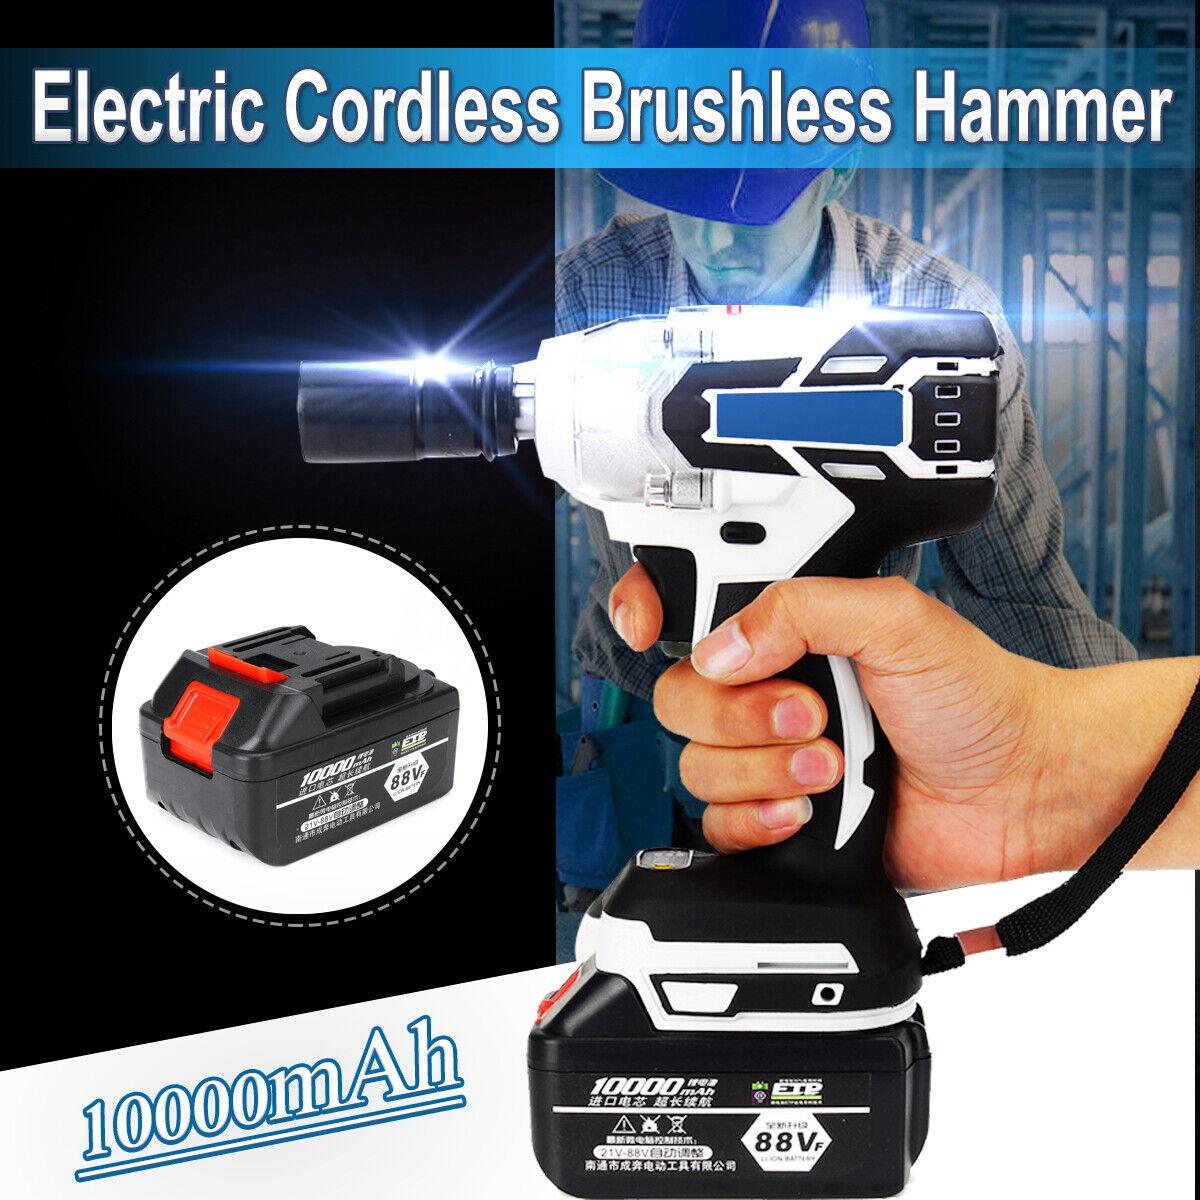 110V-220V Electric Cordless Brushless Hammer Drill Driver 10000mAh 240-520NM